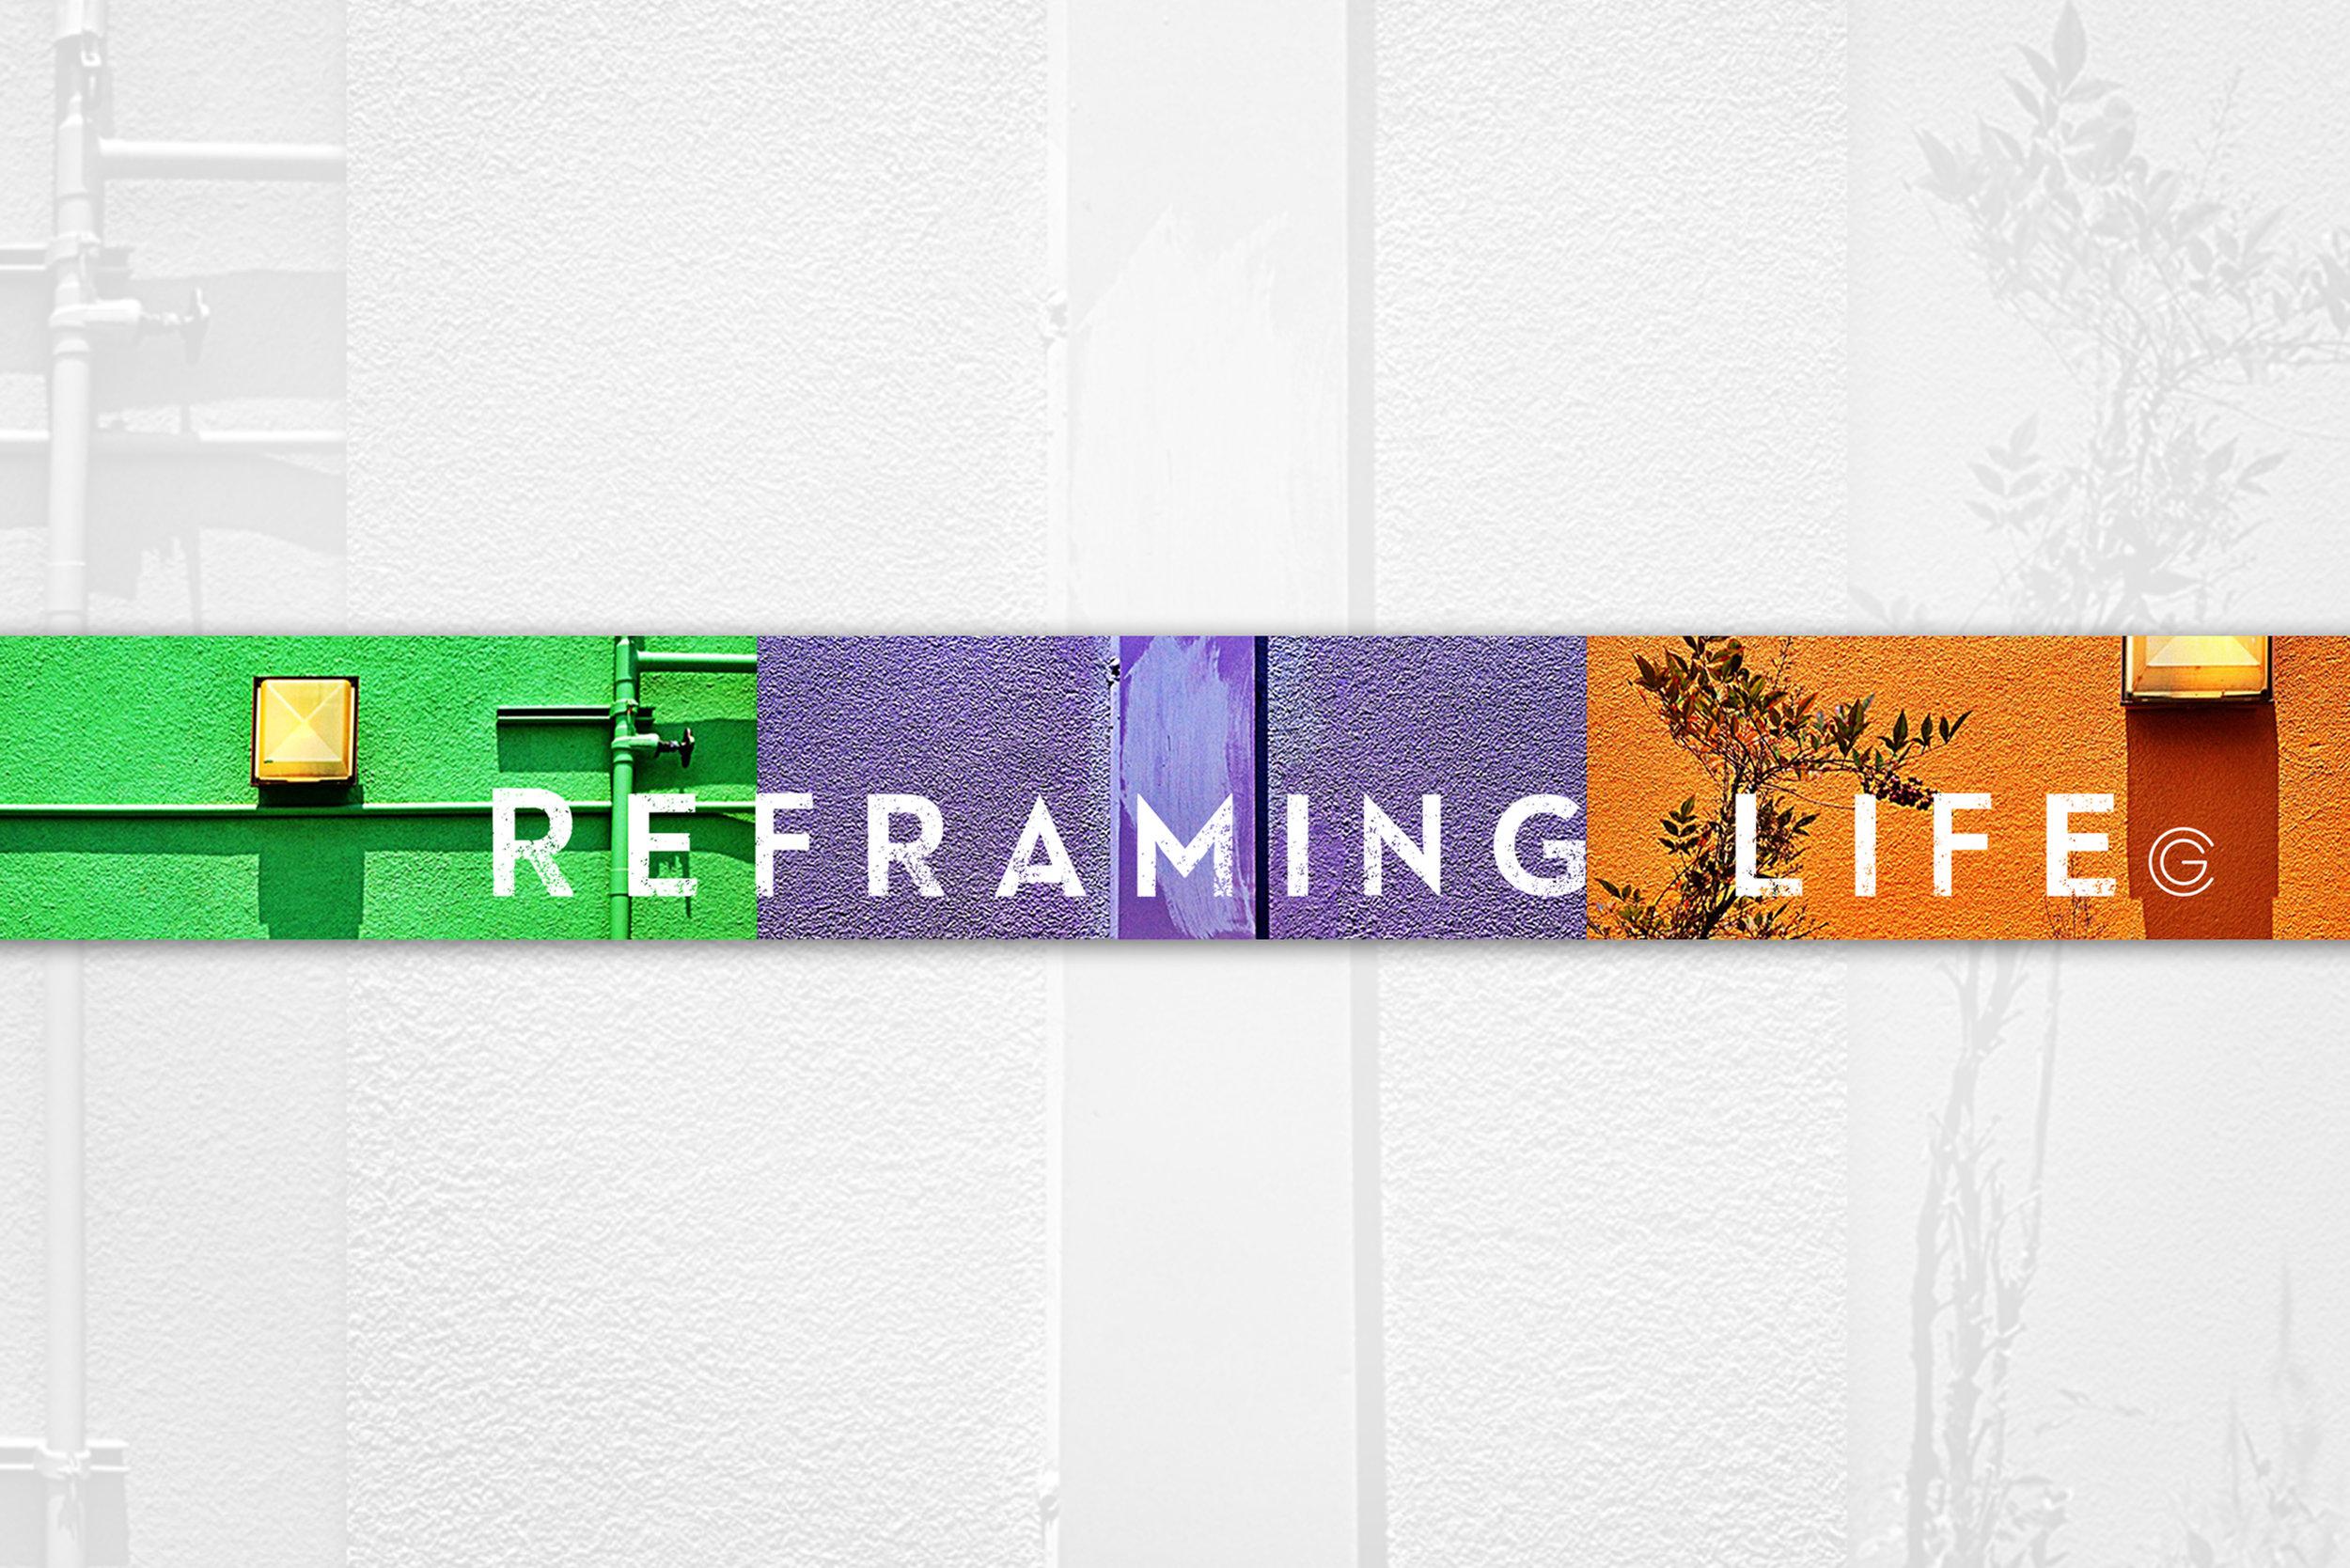 Cat's Blog: Reframing Life